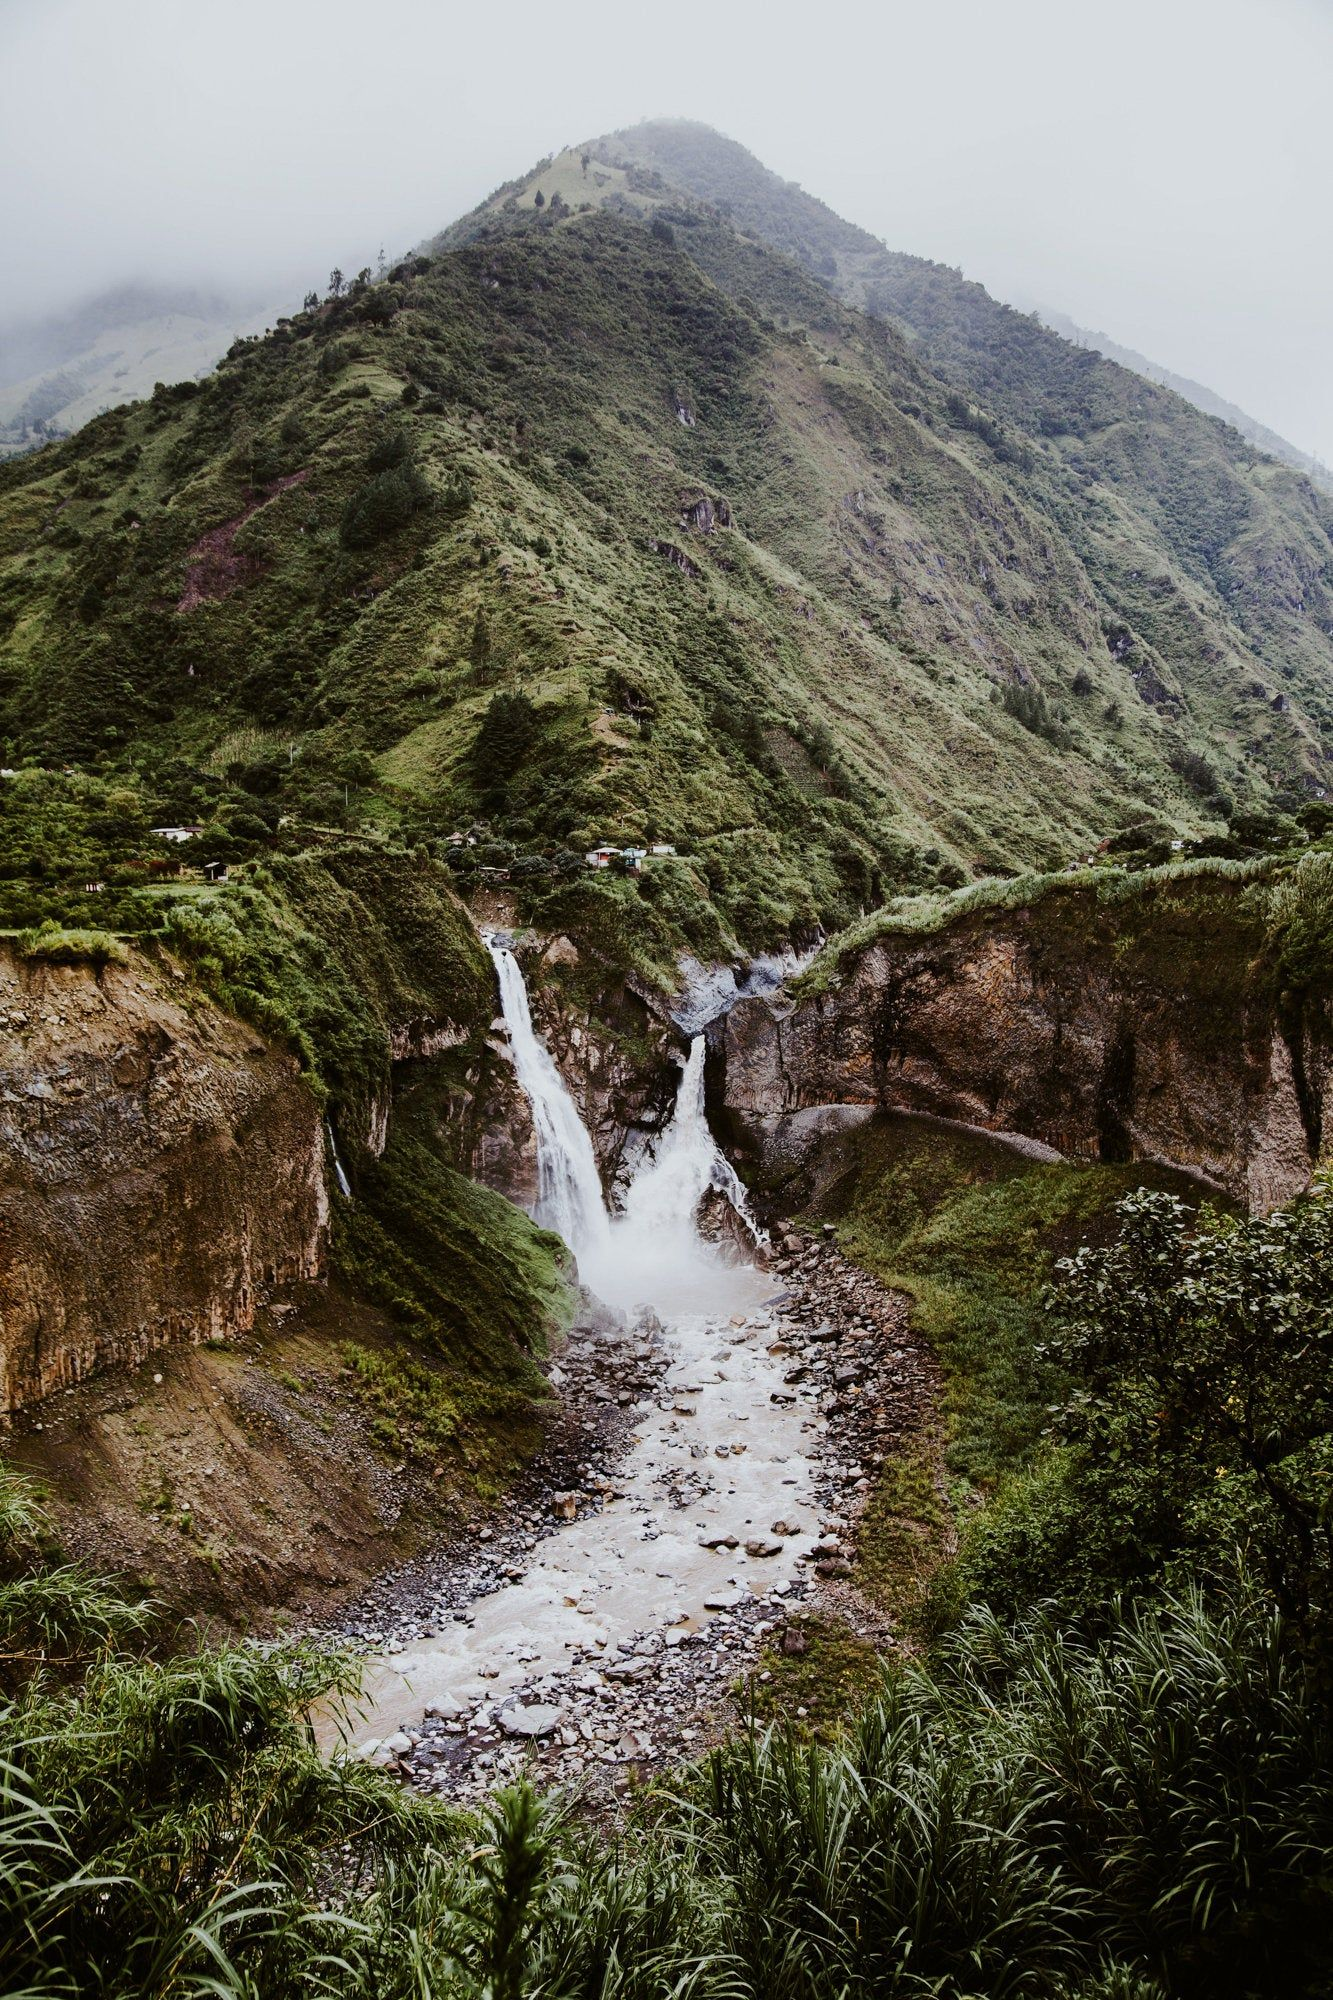 Ecuador Waterfall Print Ecuador Print Travel Photography Waterfall Print Landscape Wall Art Landscape Photography Mountain Print Landscape Photography Landscape Wall Art Mountain Print